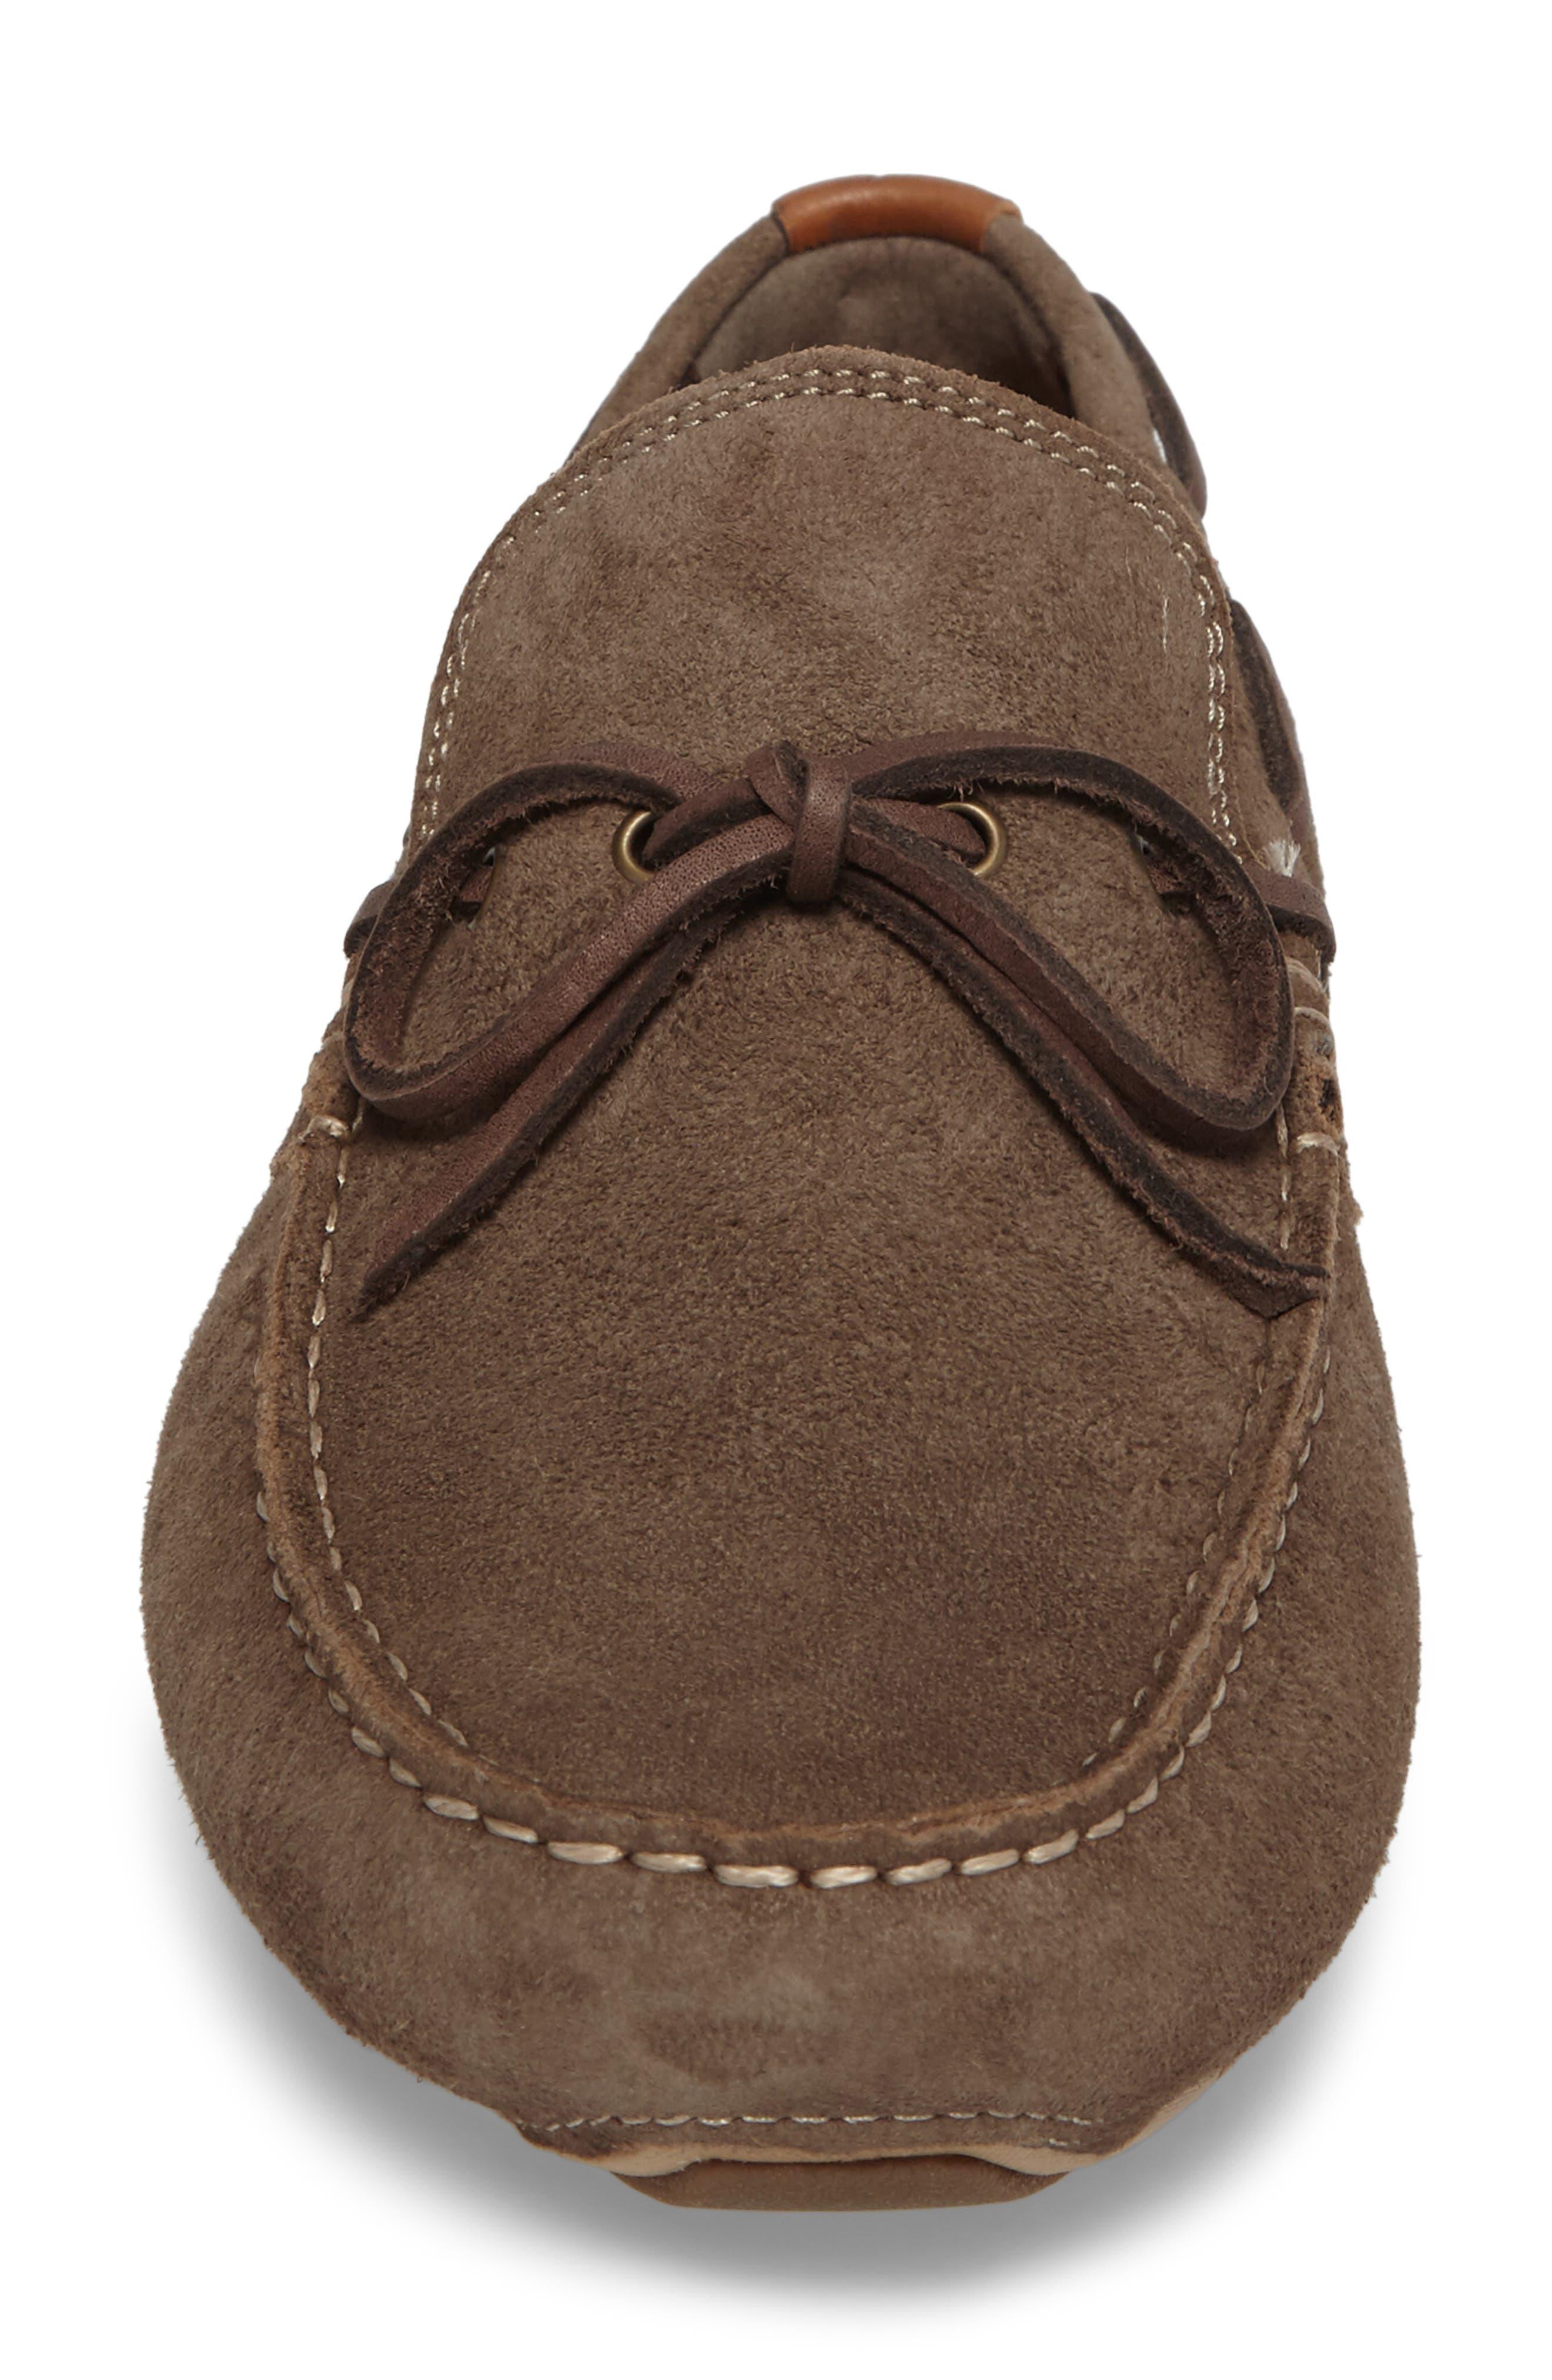 Zero Grand Moc Driving Loafer,                             Alternate thumbnail 4, color,                             Morel Leather